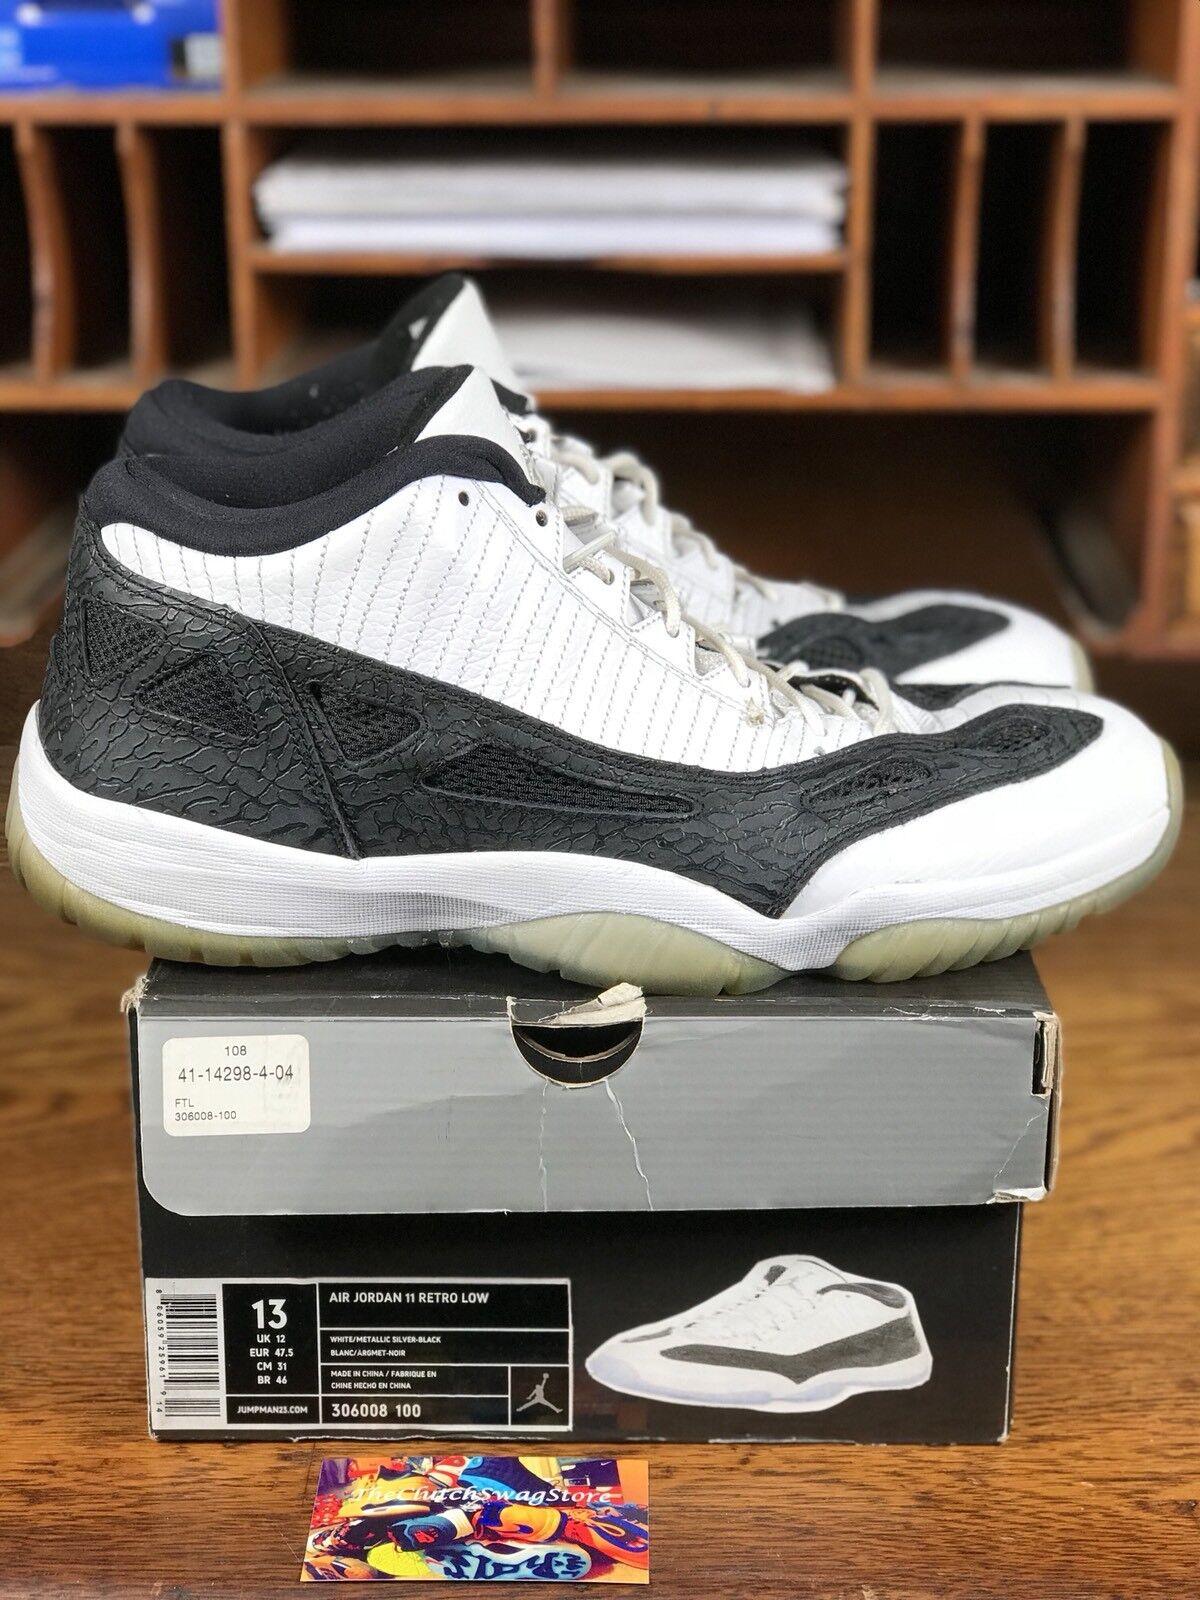 2011 Nike Air Jordan 11 XI Retro Low White/Black (306008-100) Mens Size 13